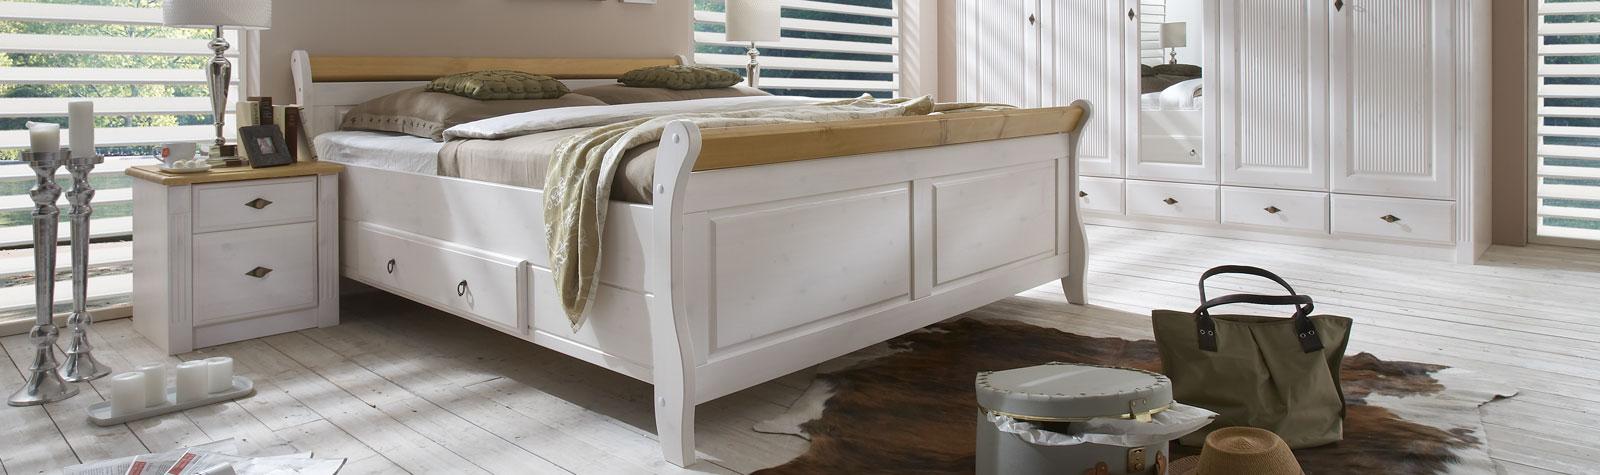 Schlafzimmer Möbel aus Massivholz skandinavisch